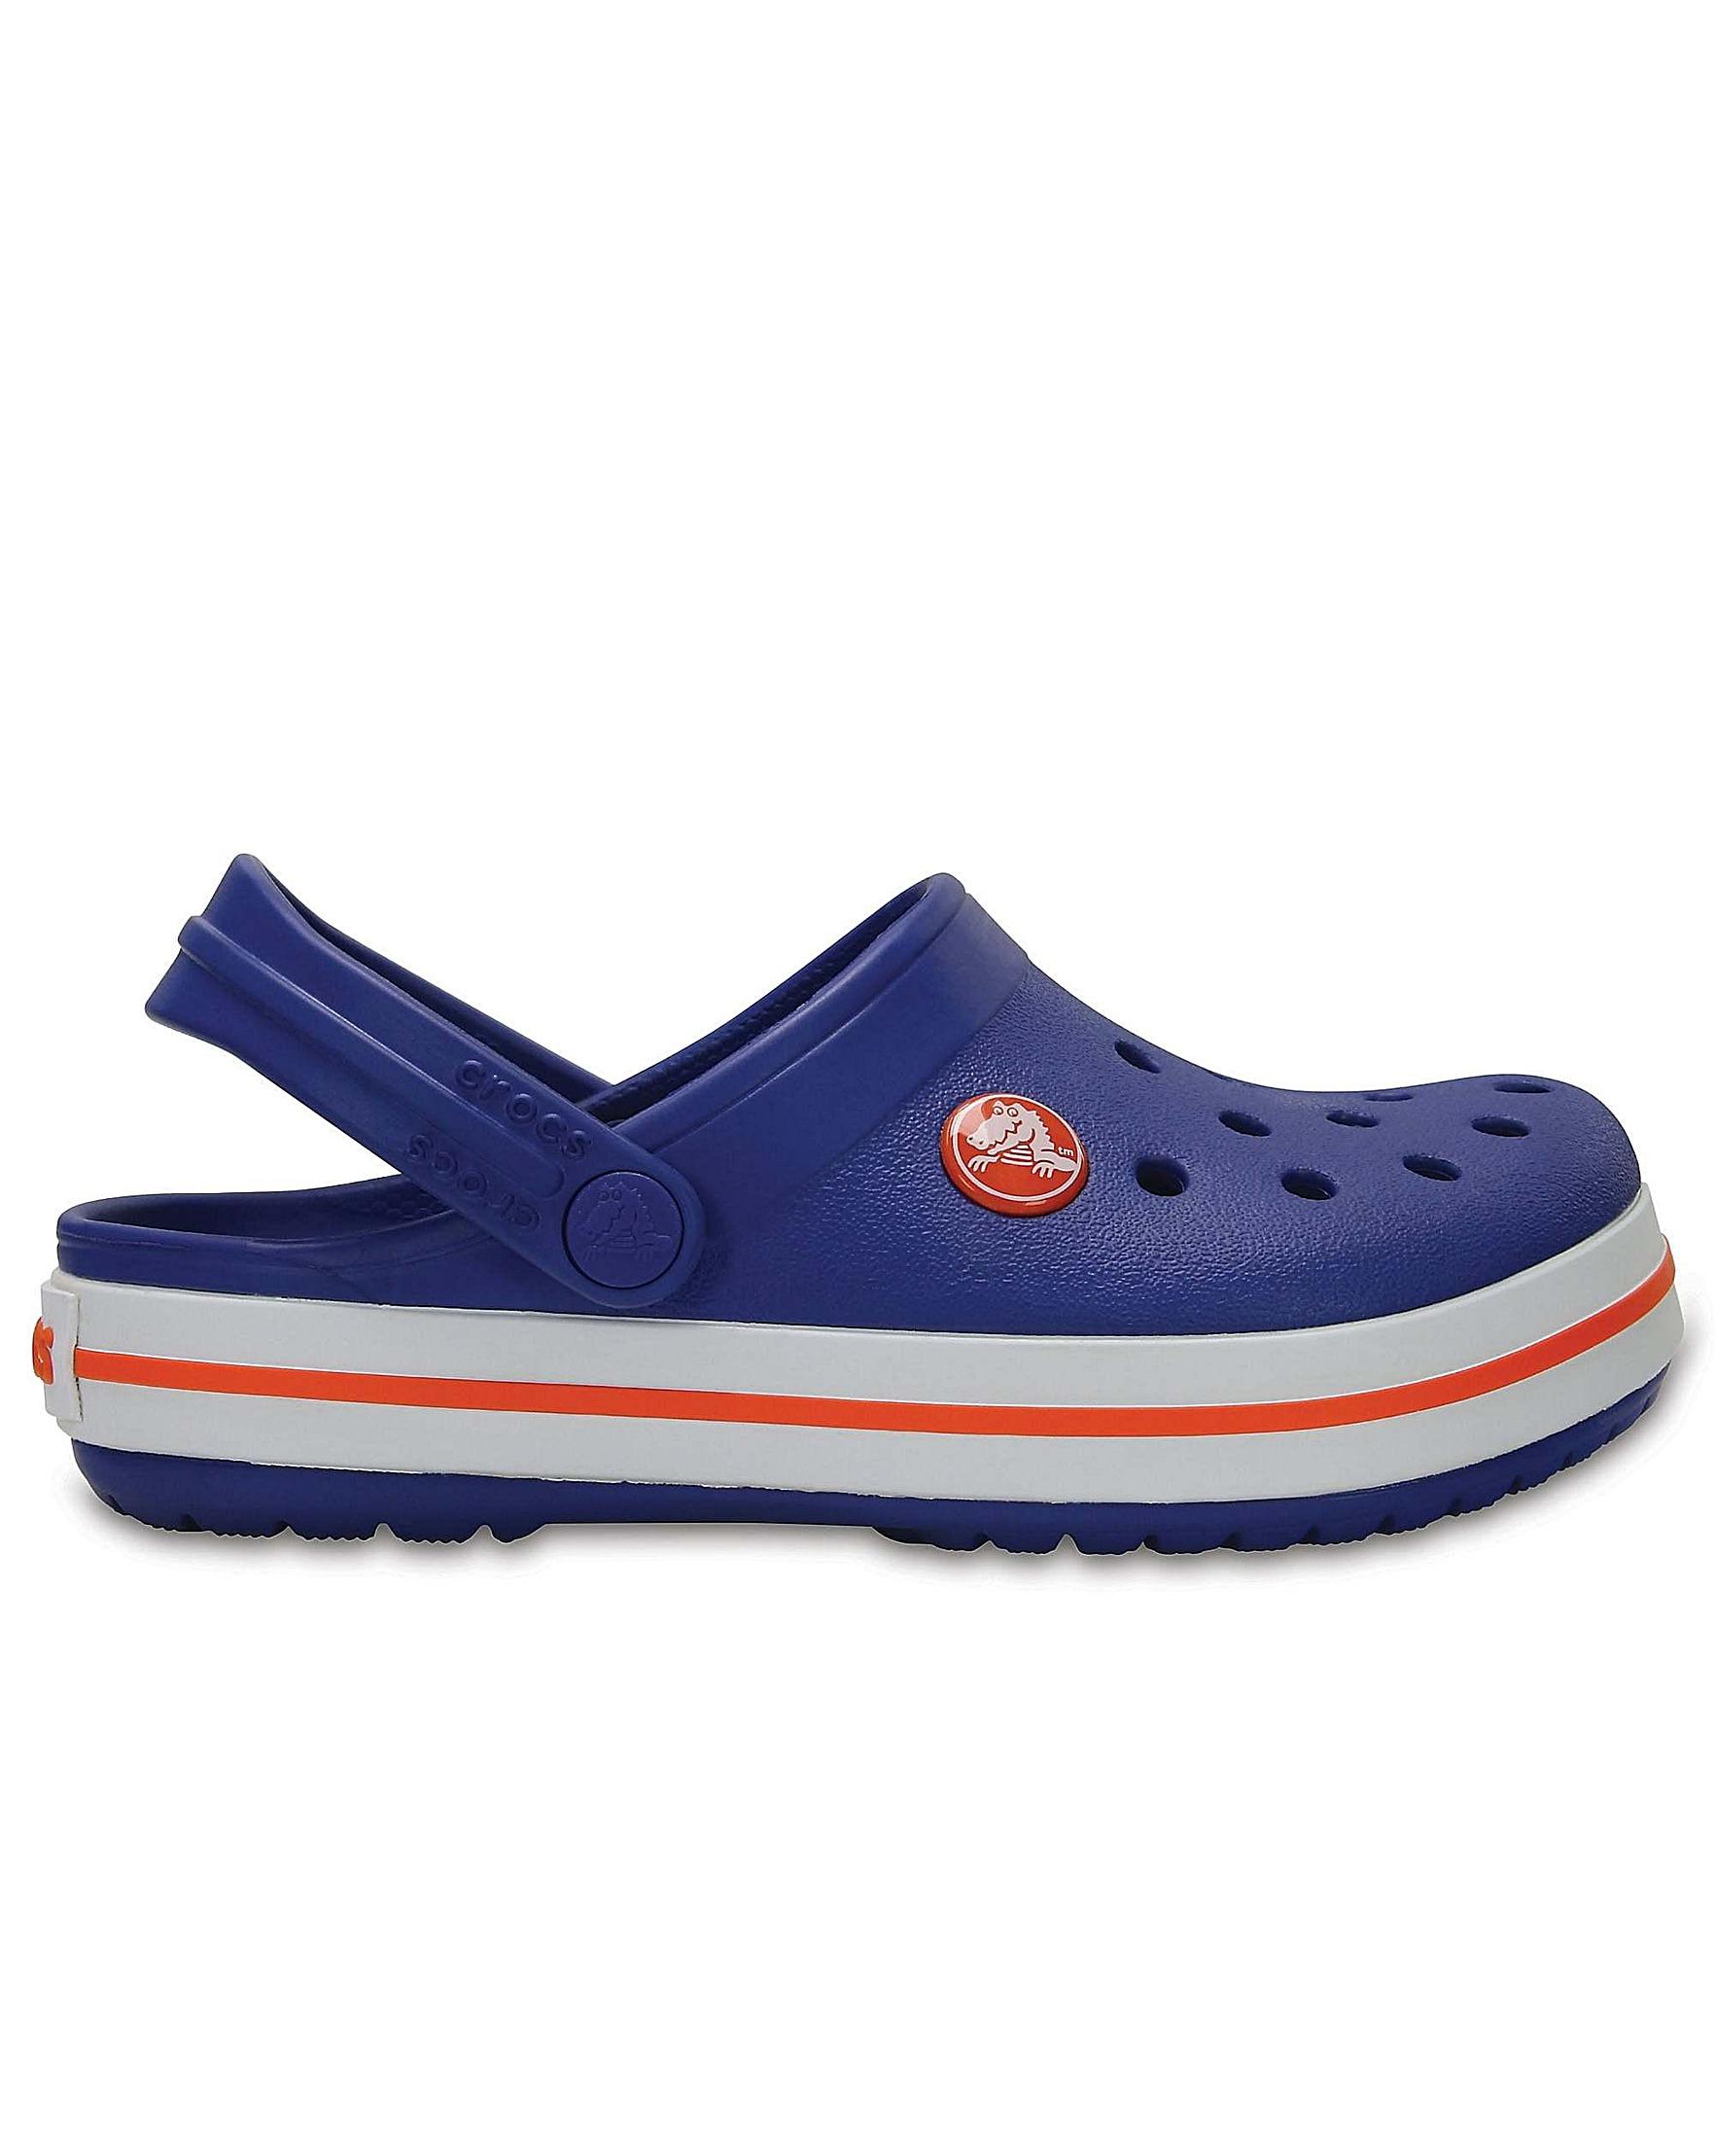 9a42468e7025e Crocs Crocband New Boys Sandals